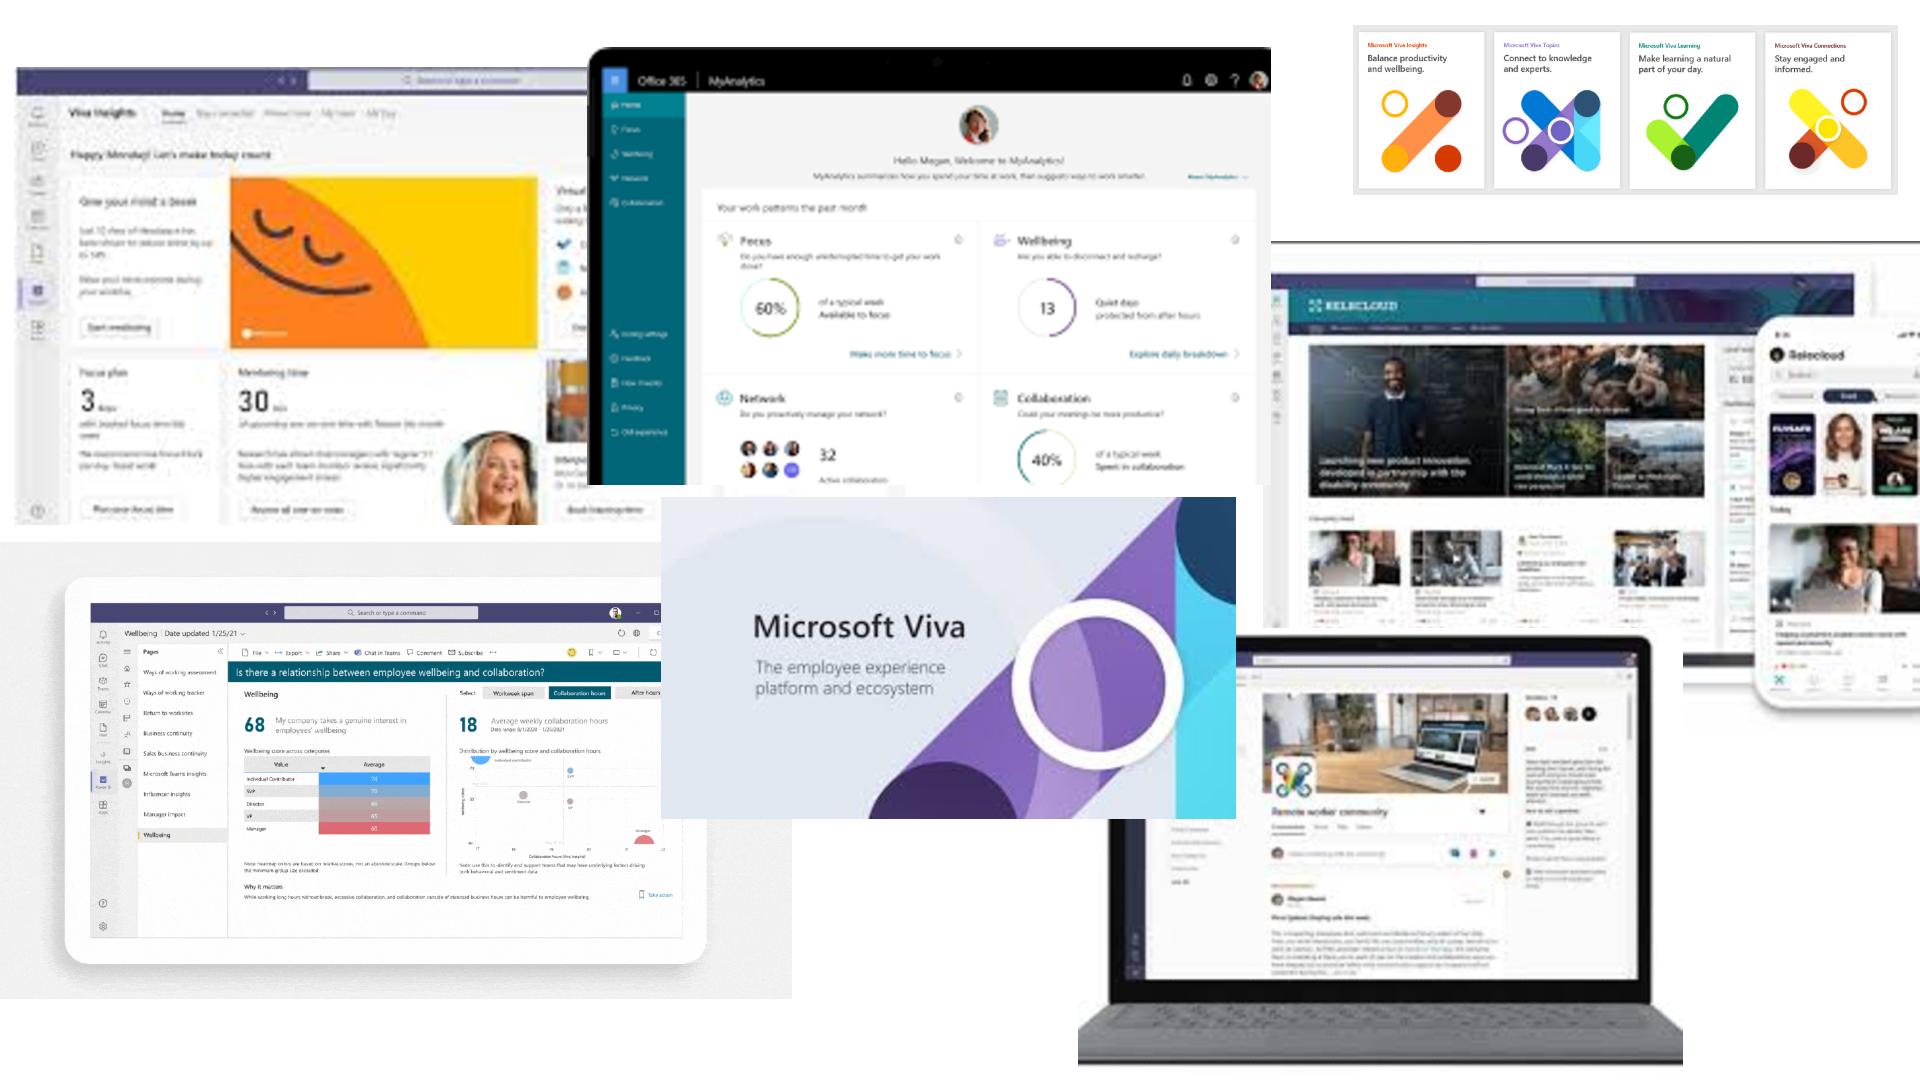 Microsoft Viva Mashup